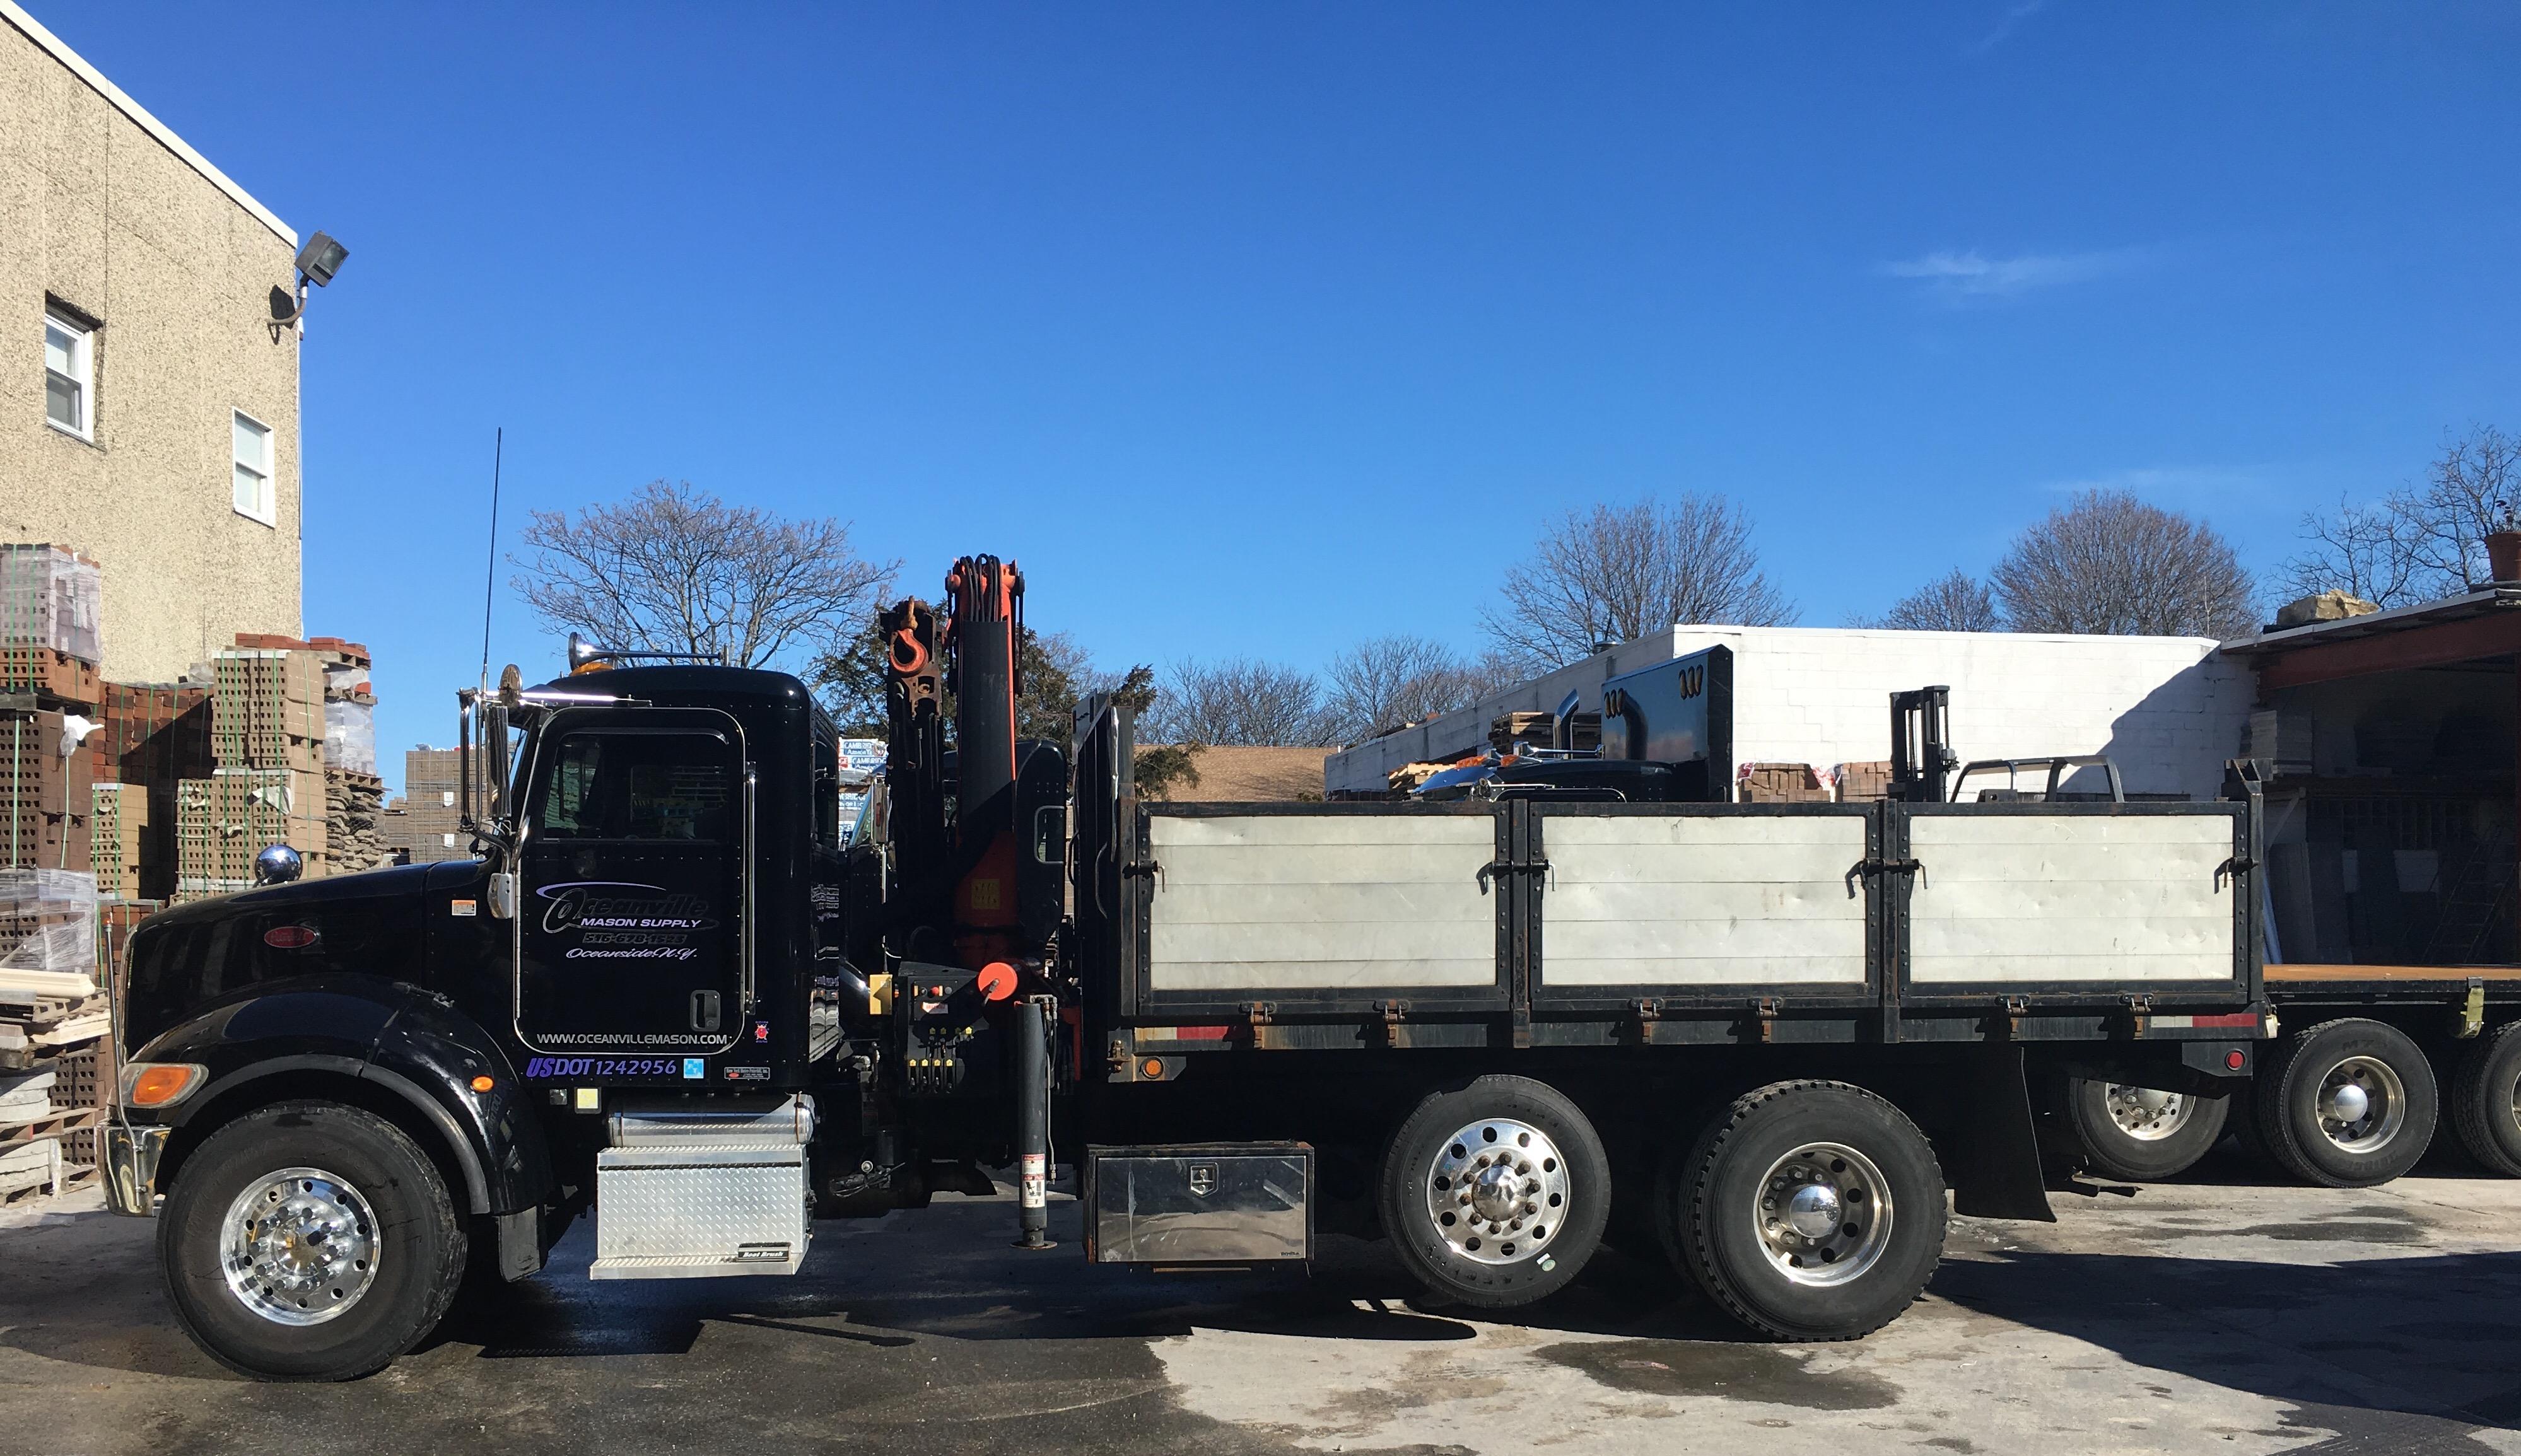 Boom/Dump truck